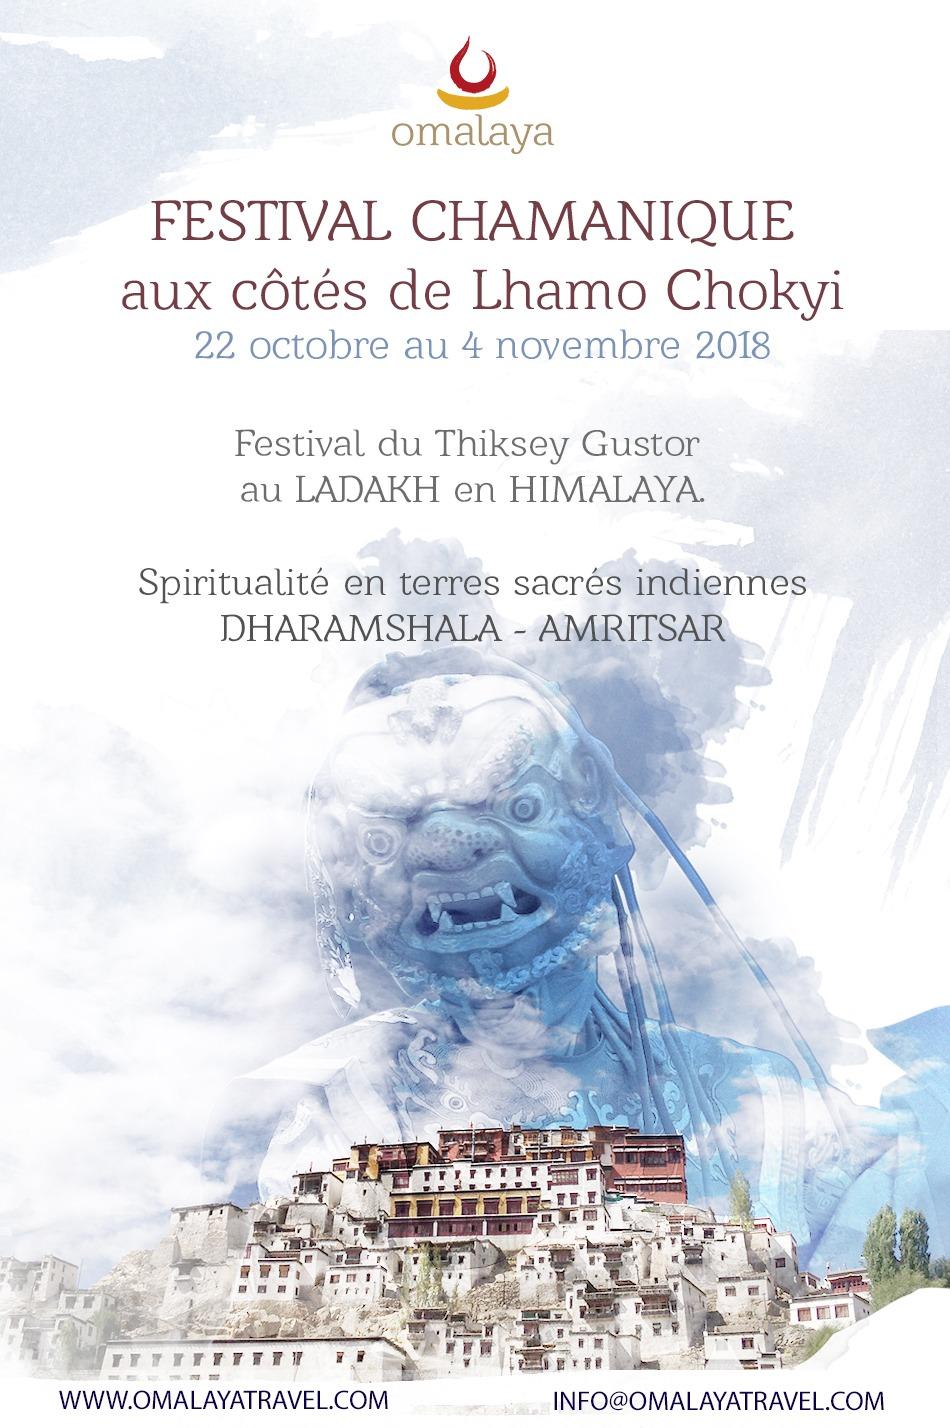 Lhamo - Thiksey Gustor